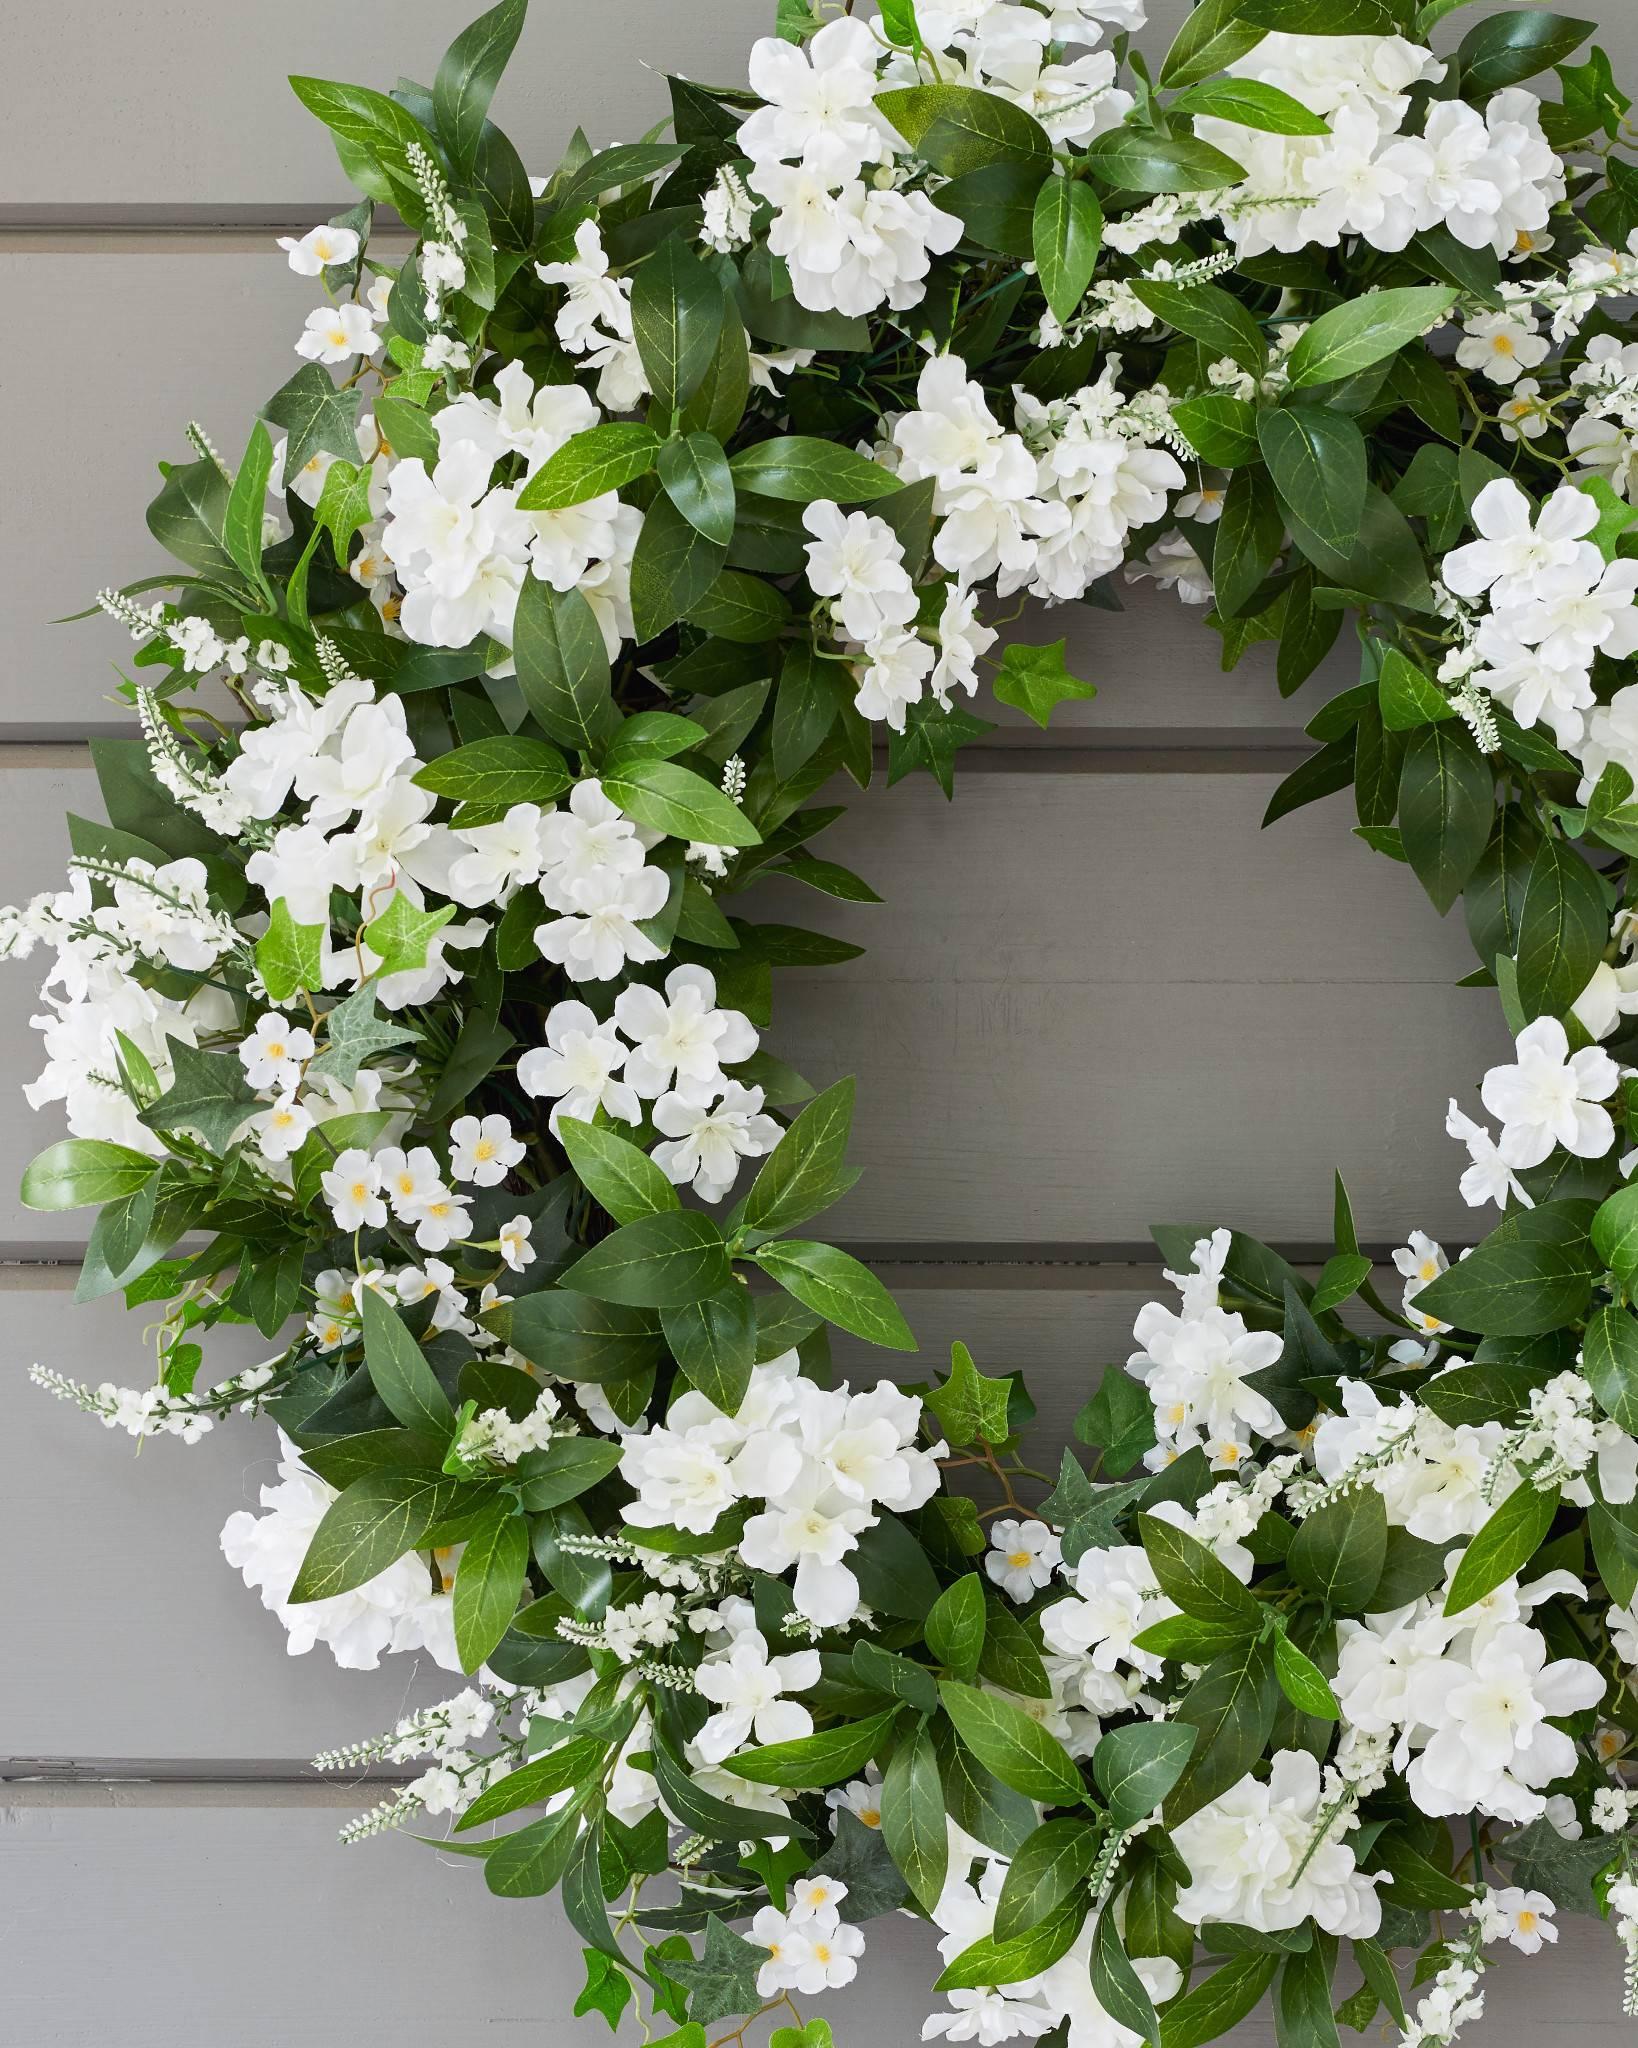 Outdoor White Rhapsody Foliage | Balsam Hill